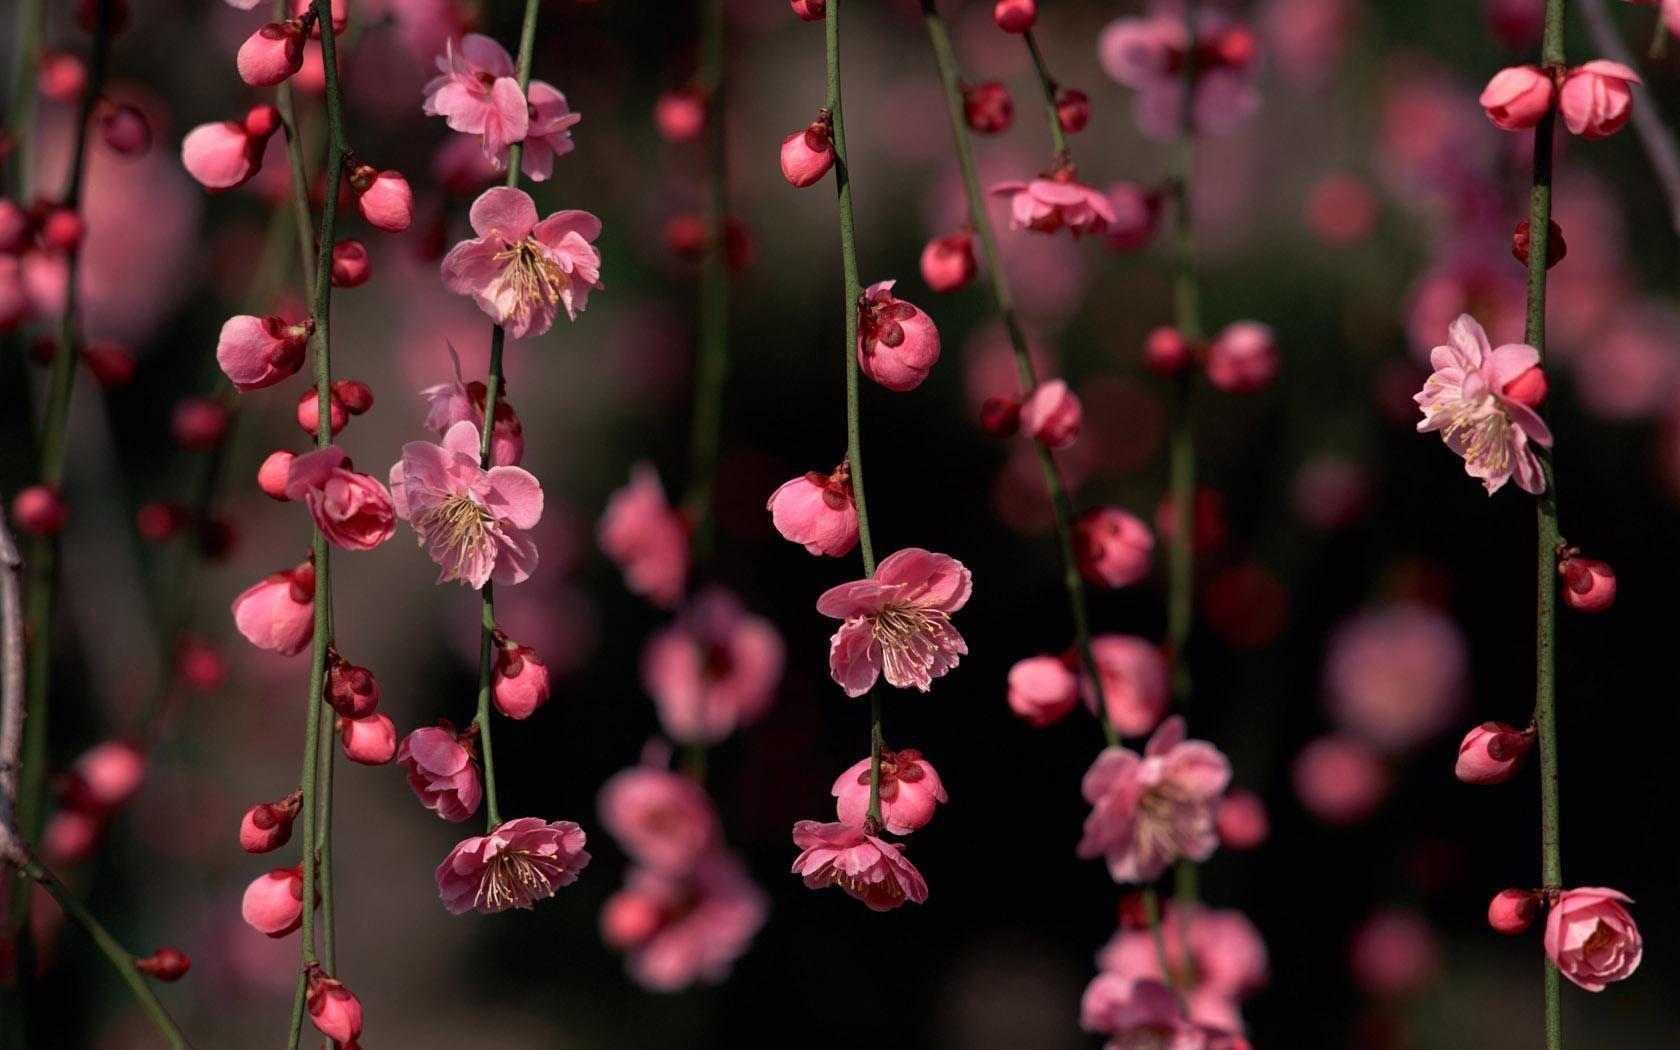 Spring Flower Wallpapers - HD Wallpapers Inn